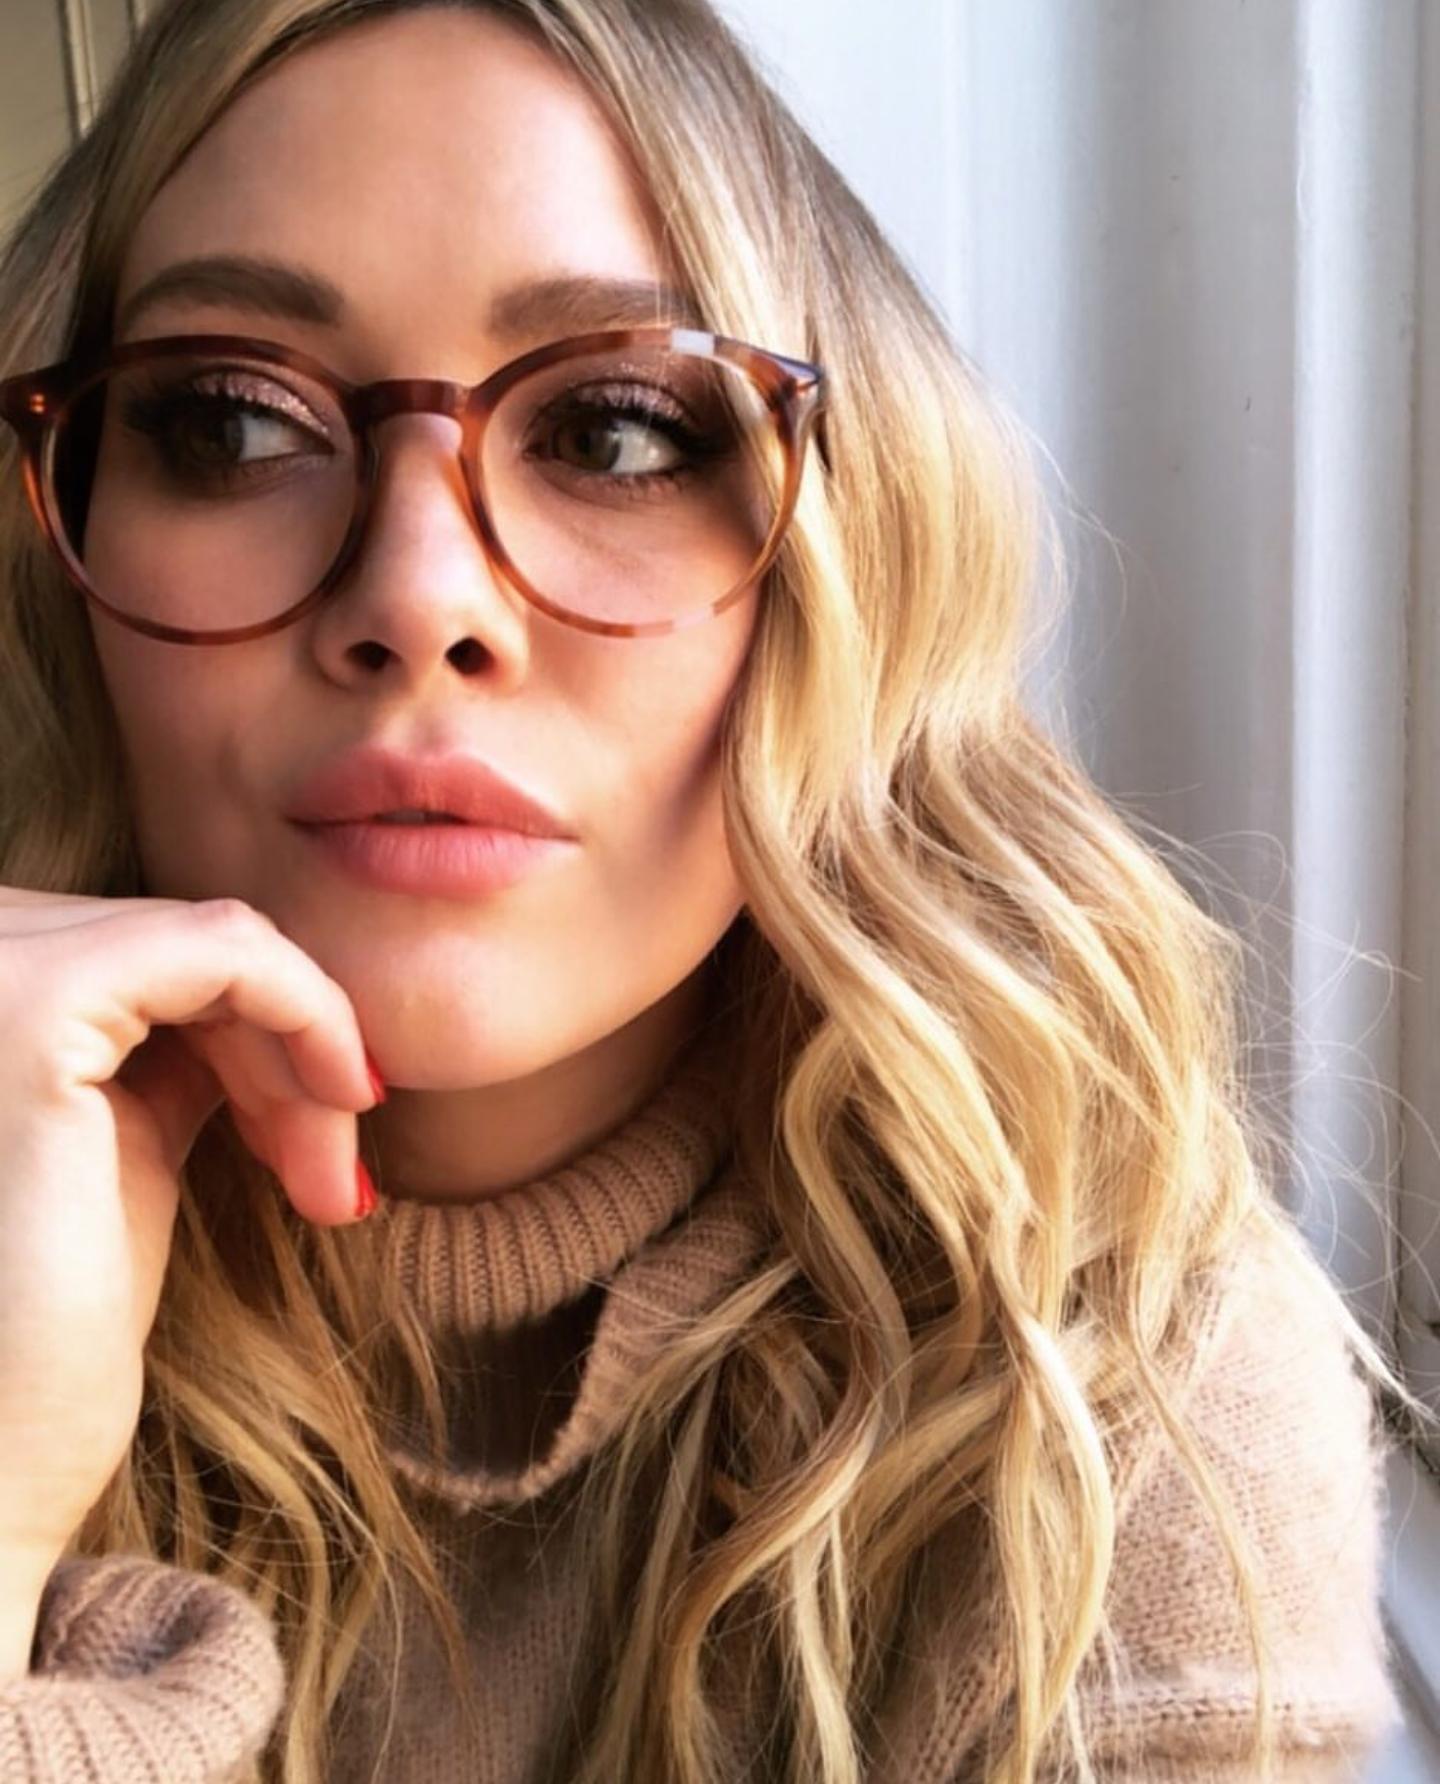 Hilary Duff Porn Photo - EPORNER